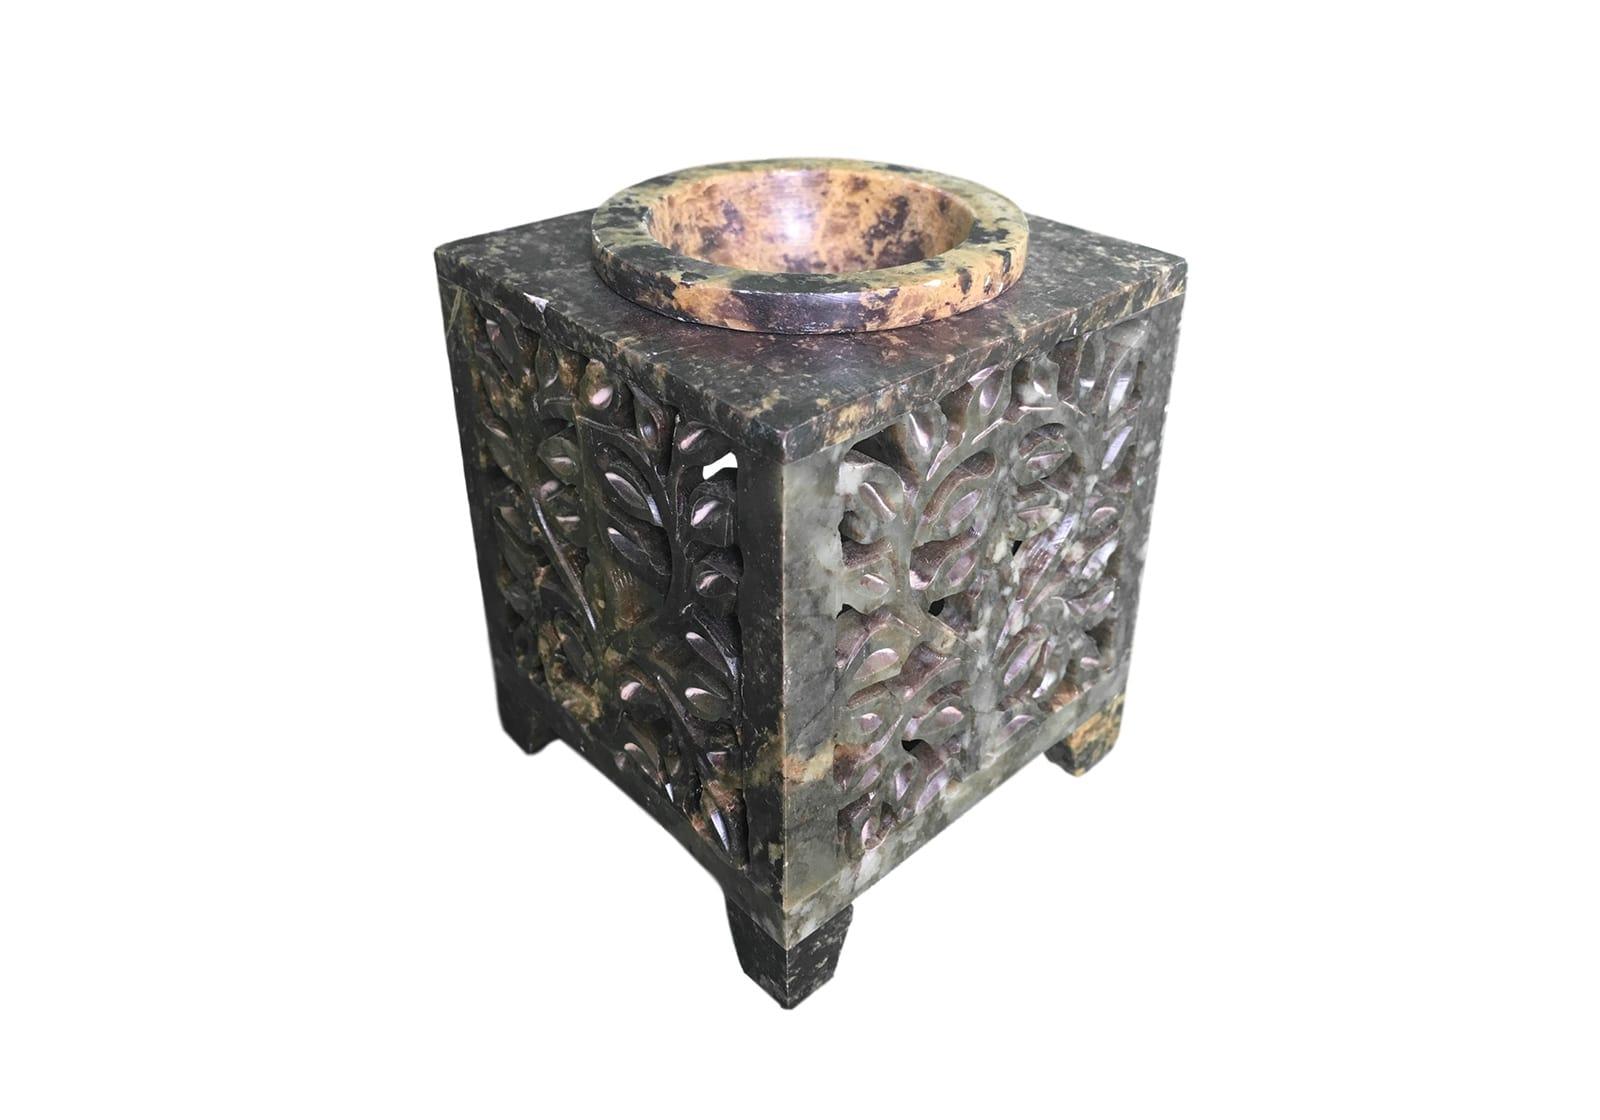 Фото Аромалампа каменная квадратная 9*7,5*7,5 см Индия (арт.514)